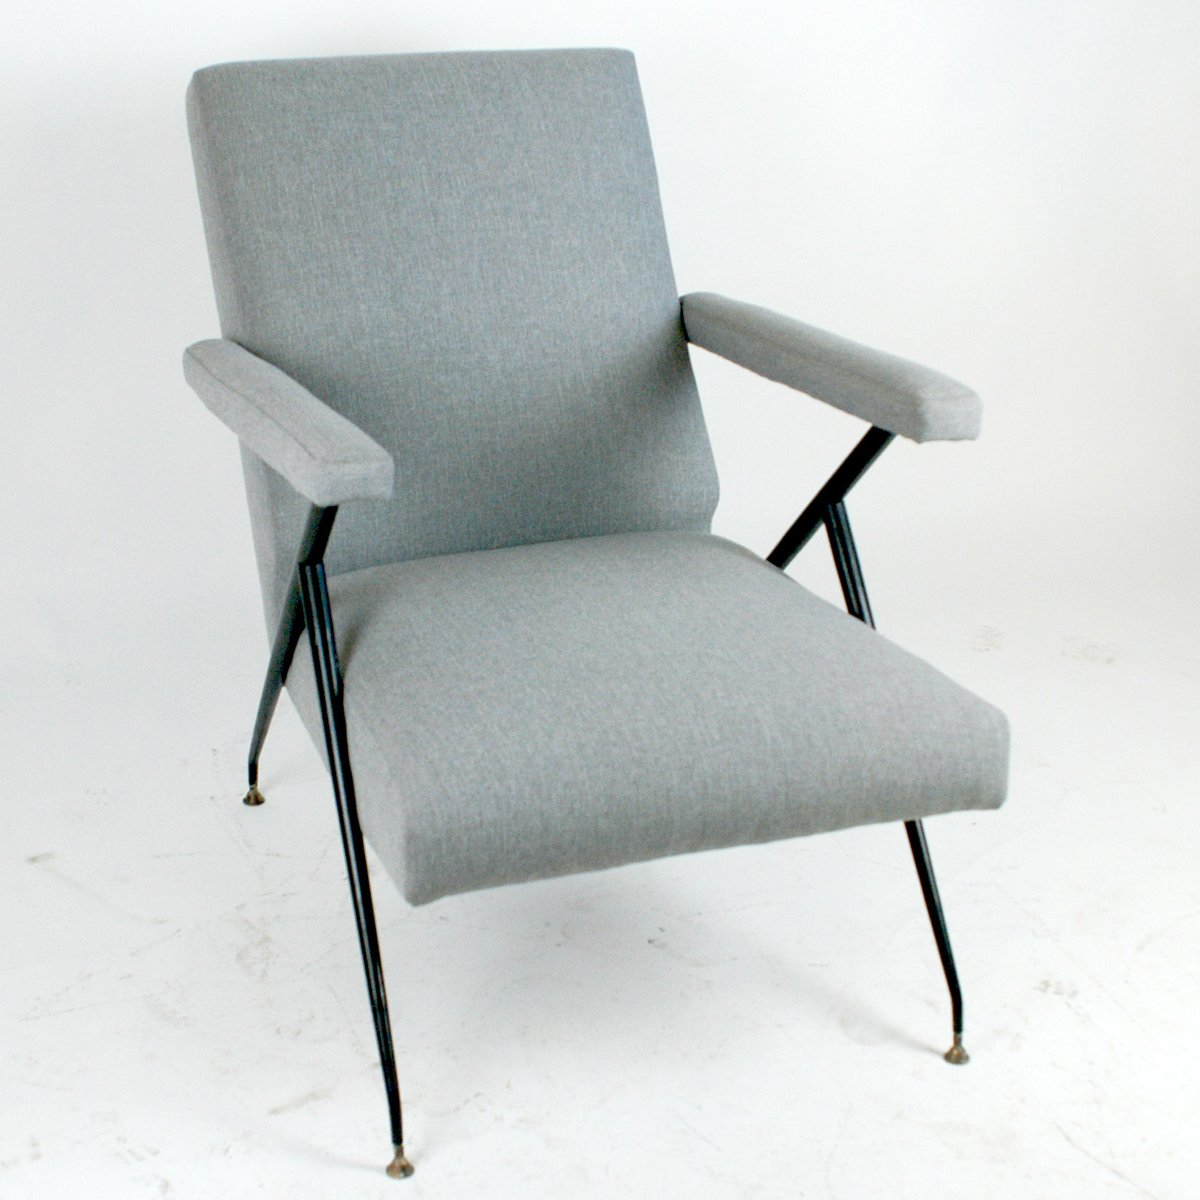 italienischer verstellbarer mid century sessel bei pamono. Black Bedroom Furniture Sets. Home Design Ideas